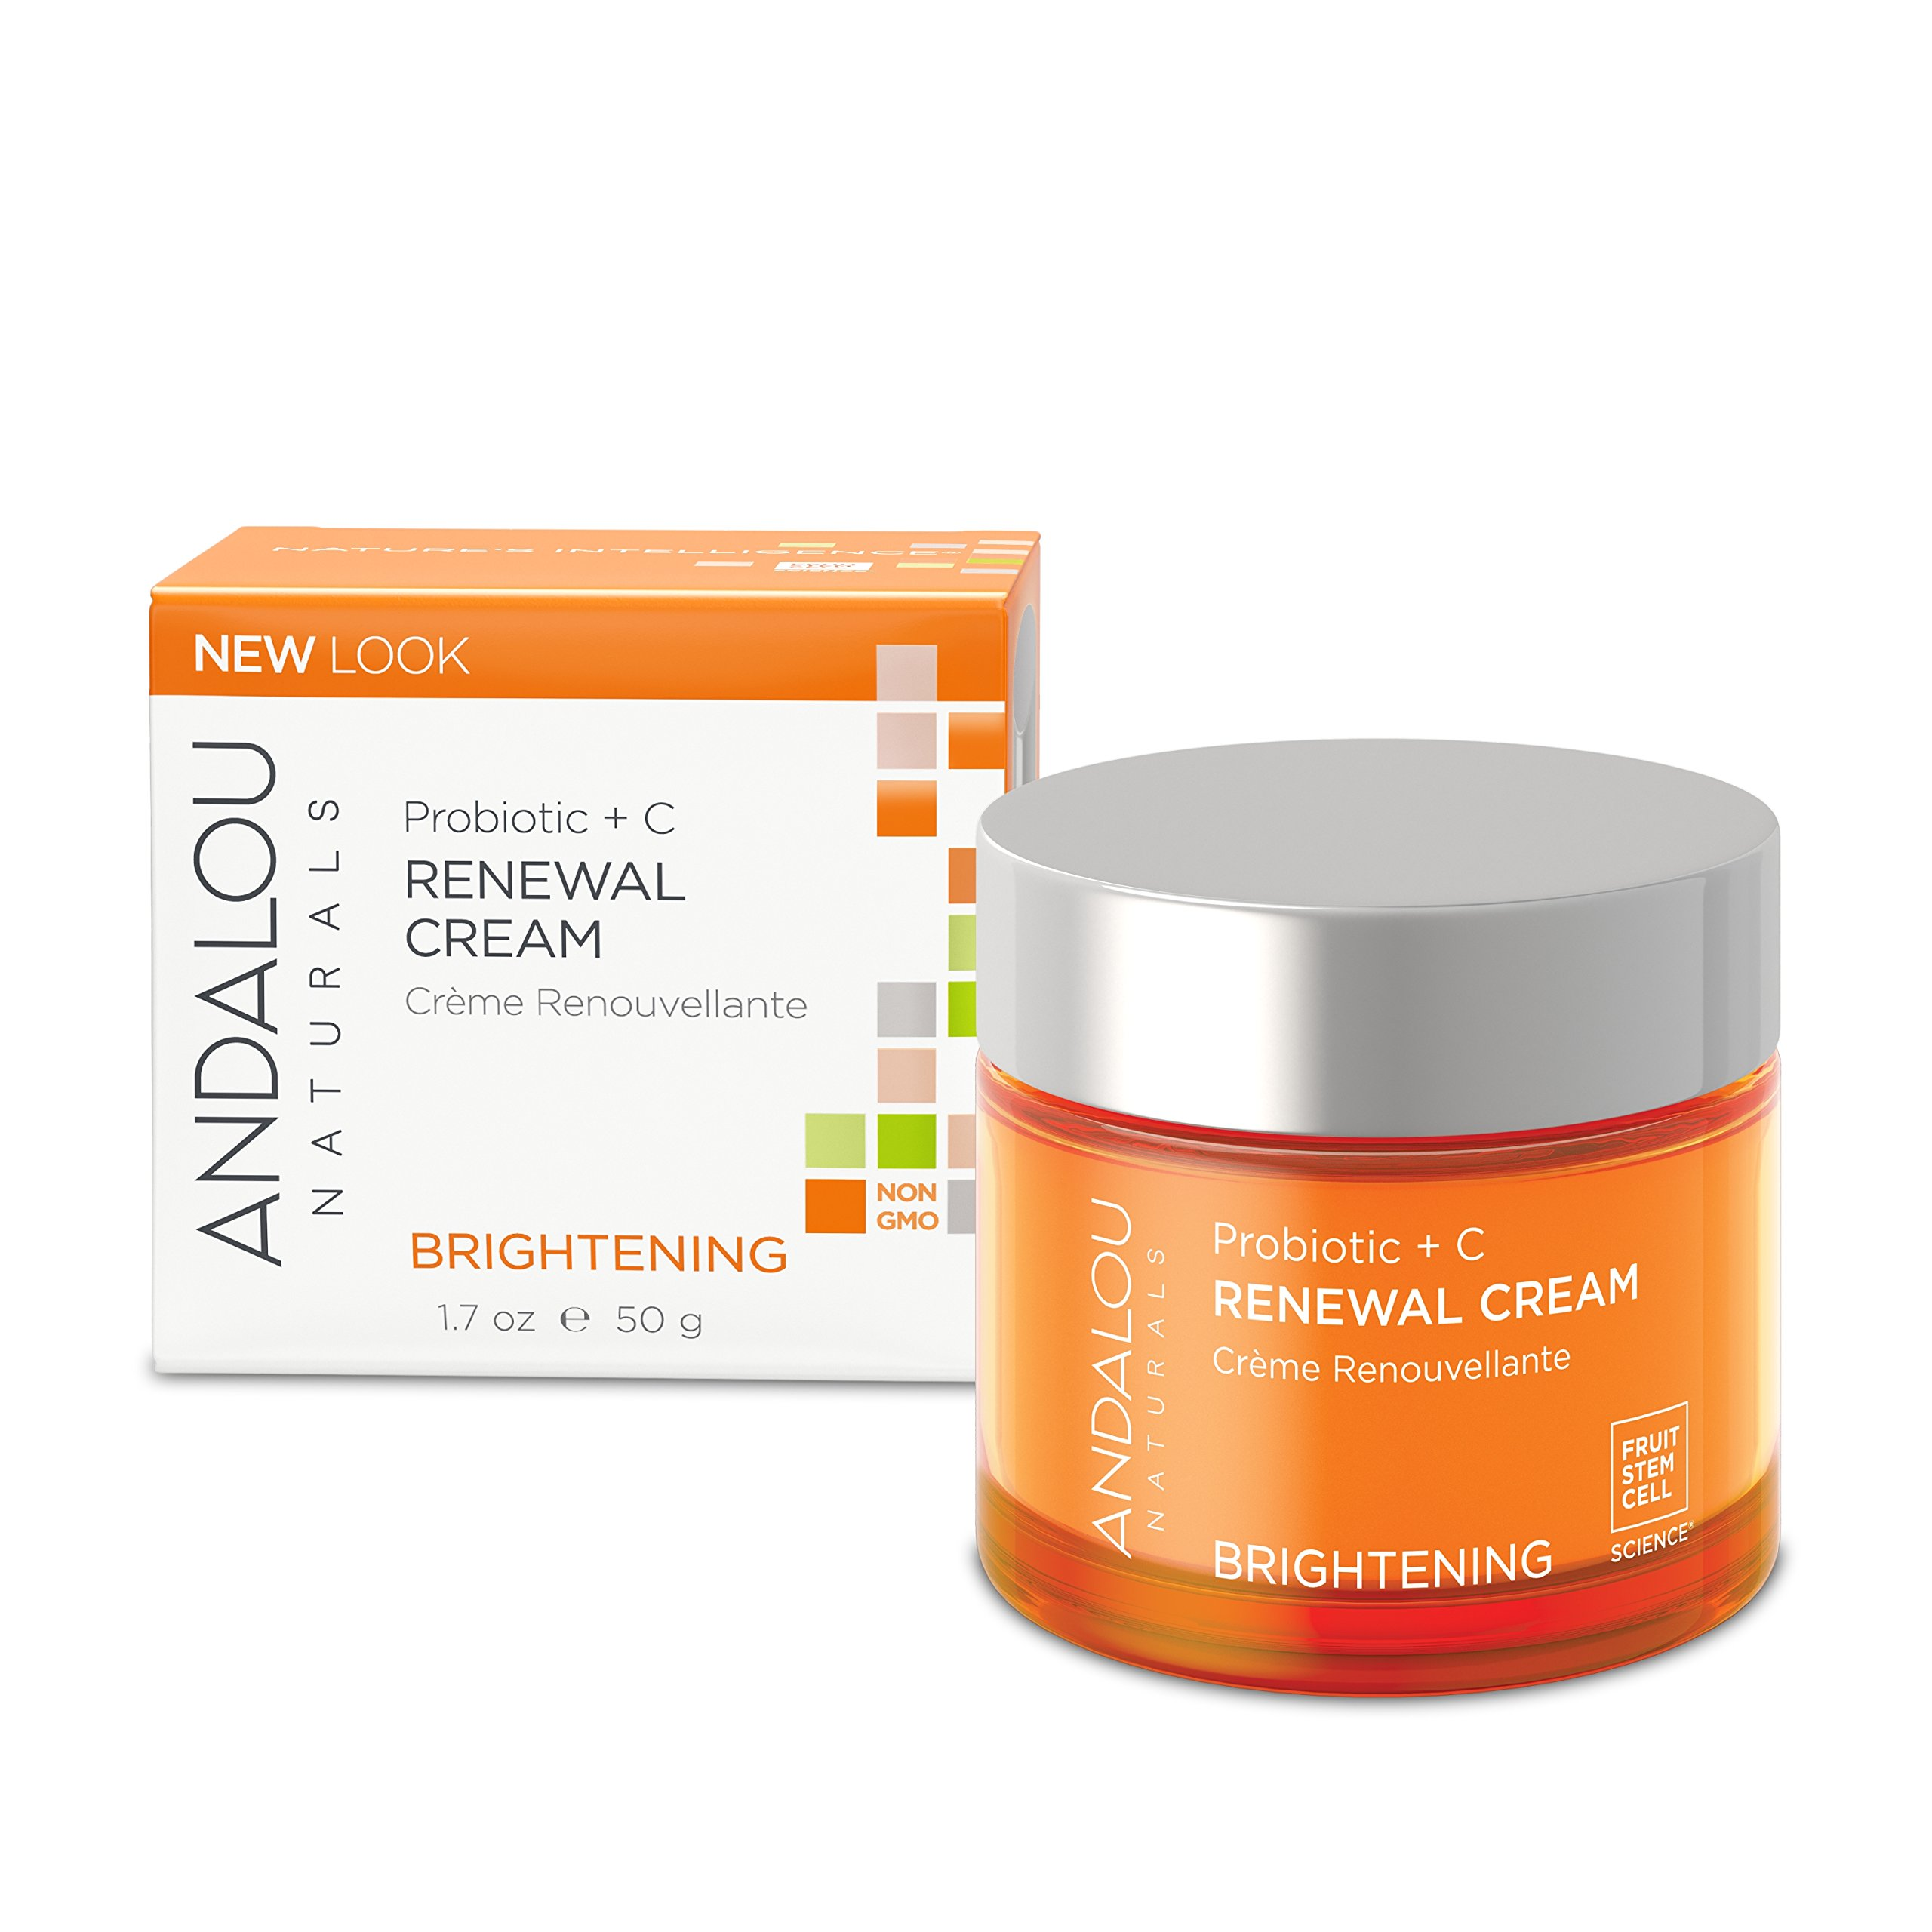 Andalou Naturals Probiotic + C Renewal Cream, 1.7 Ounce by Andalou Naturals